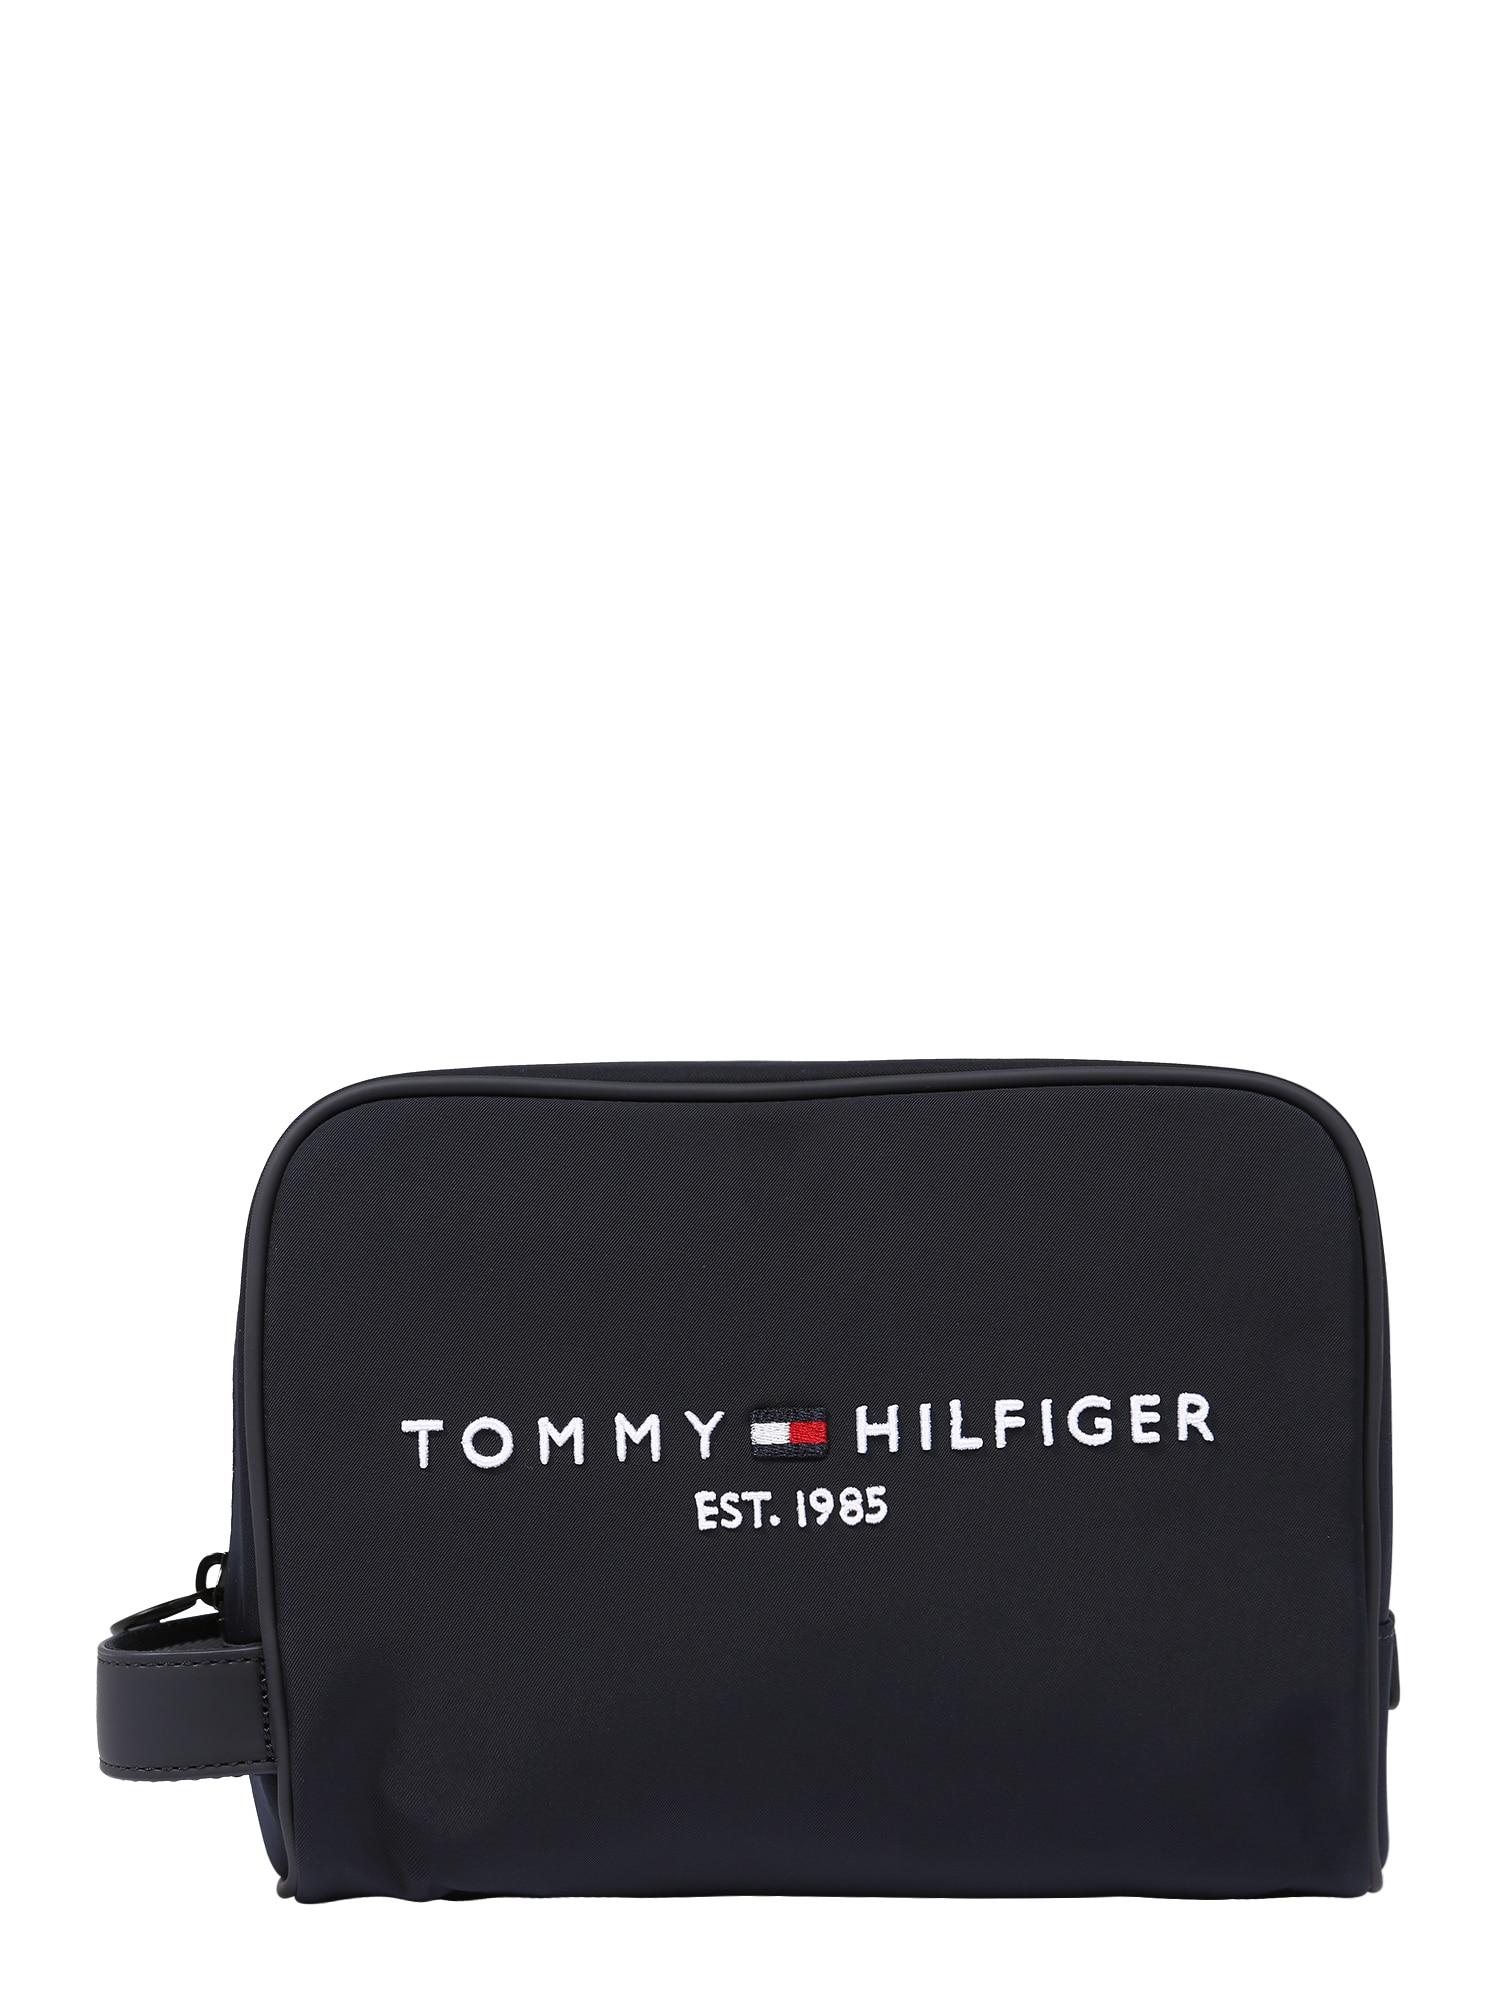 TOMMY HILFIGER Tualeto reikmenų / kosmetikos krepšys tamsiai mėlyna / balta / raudona